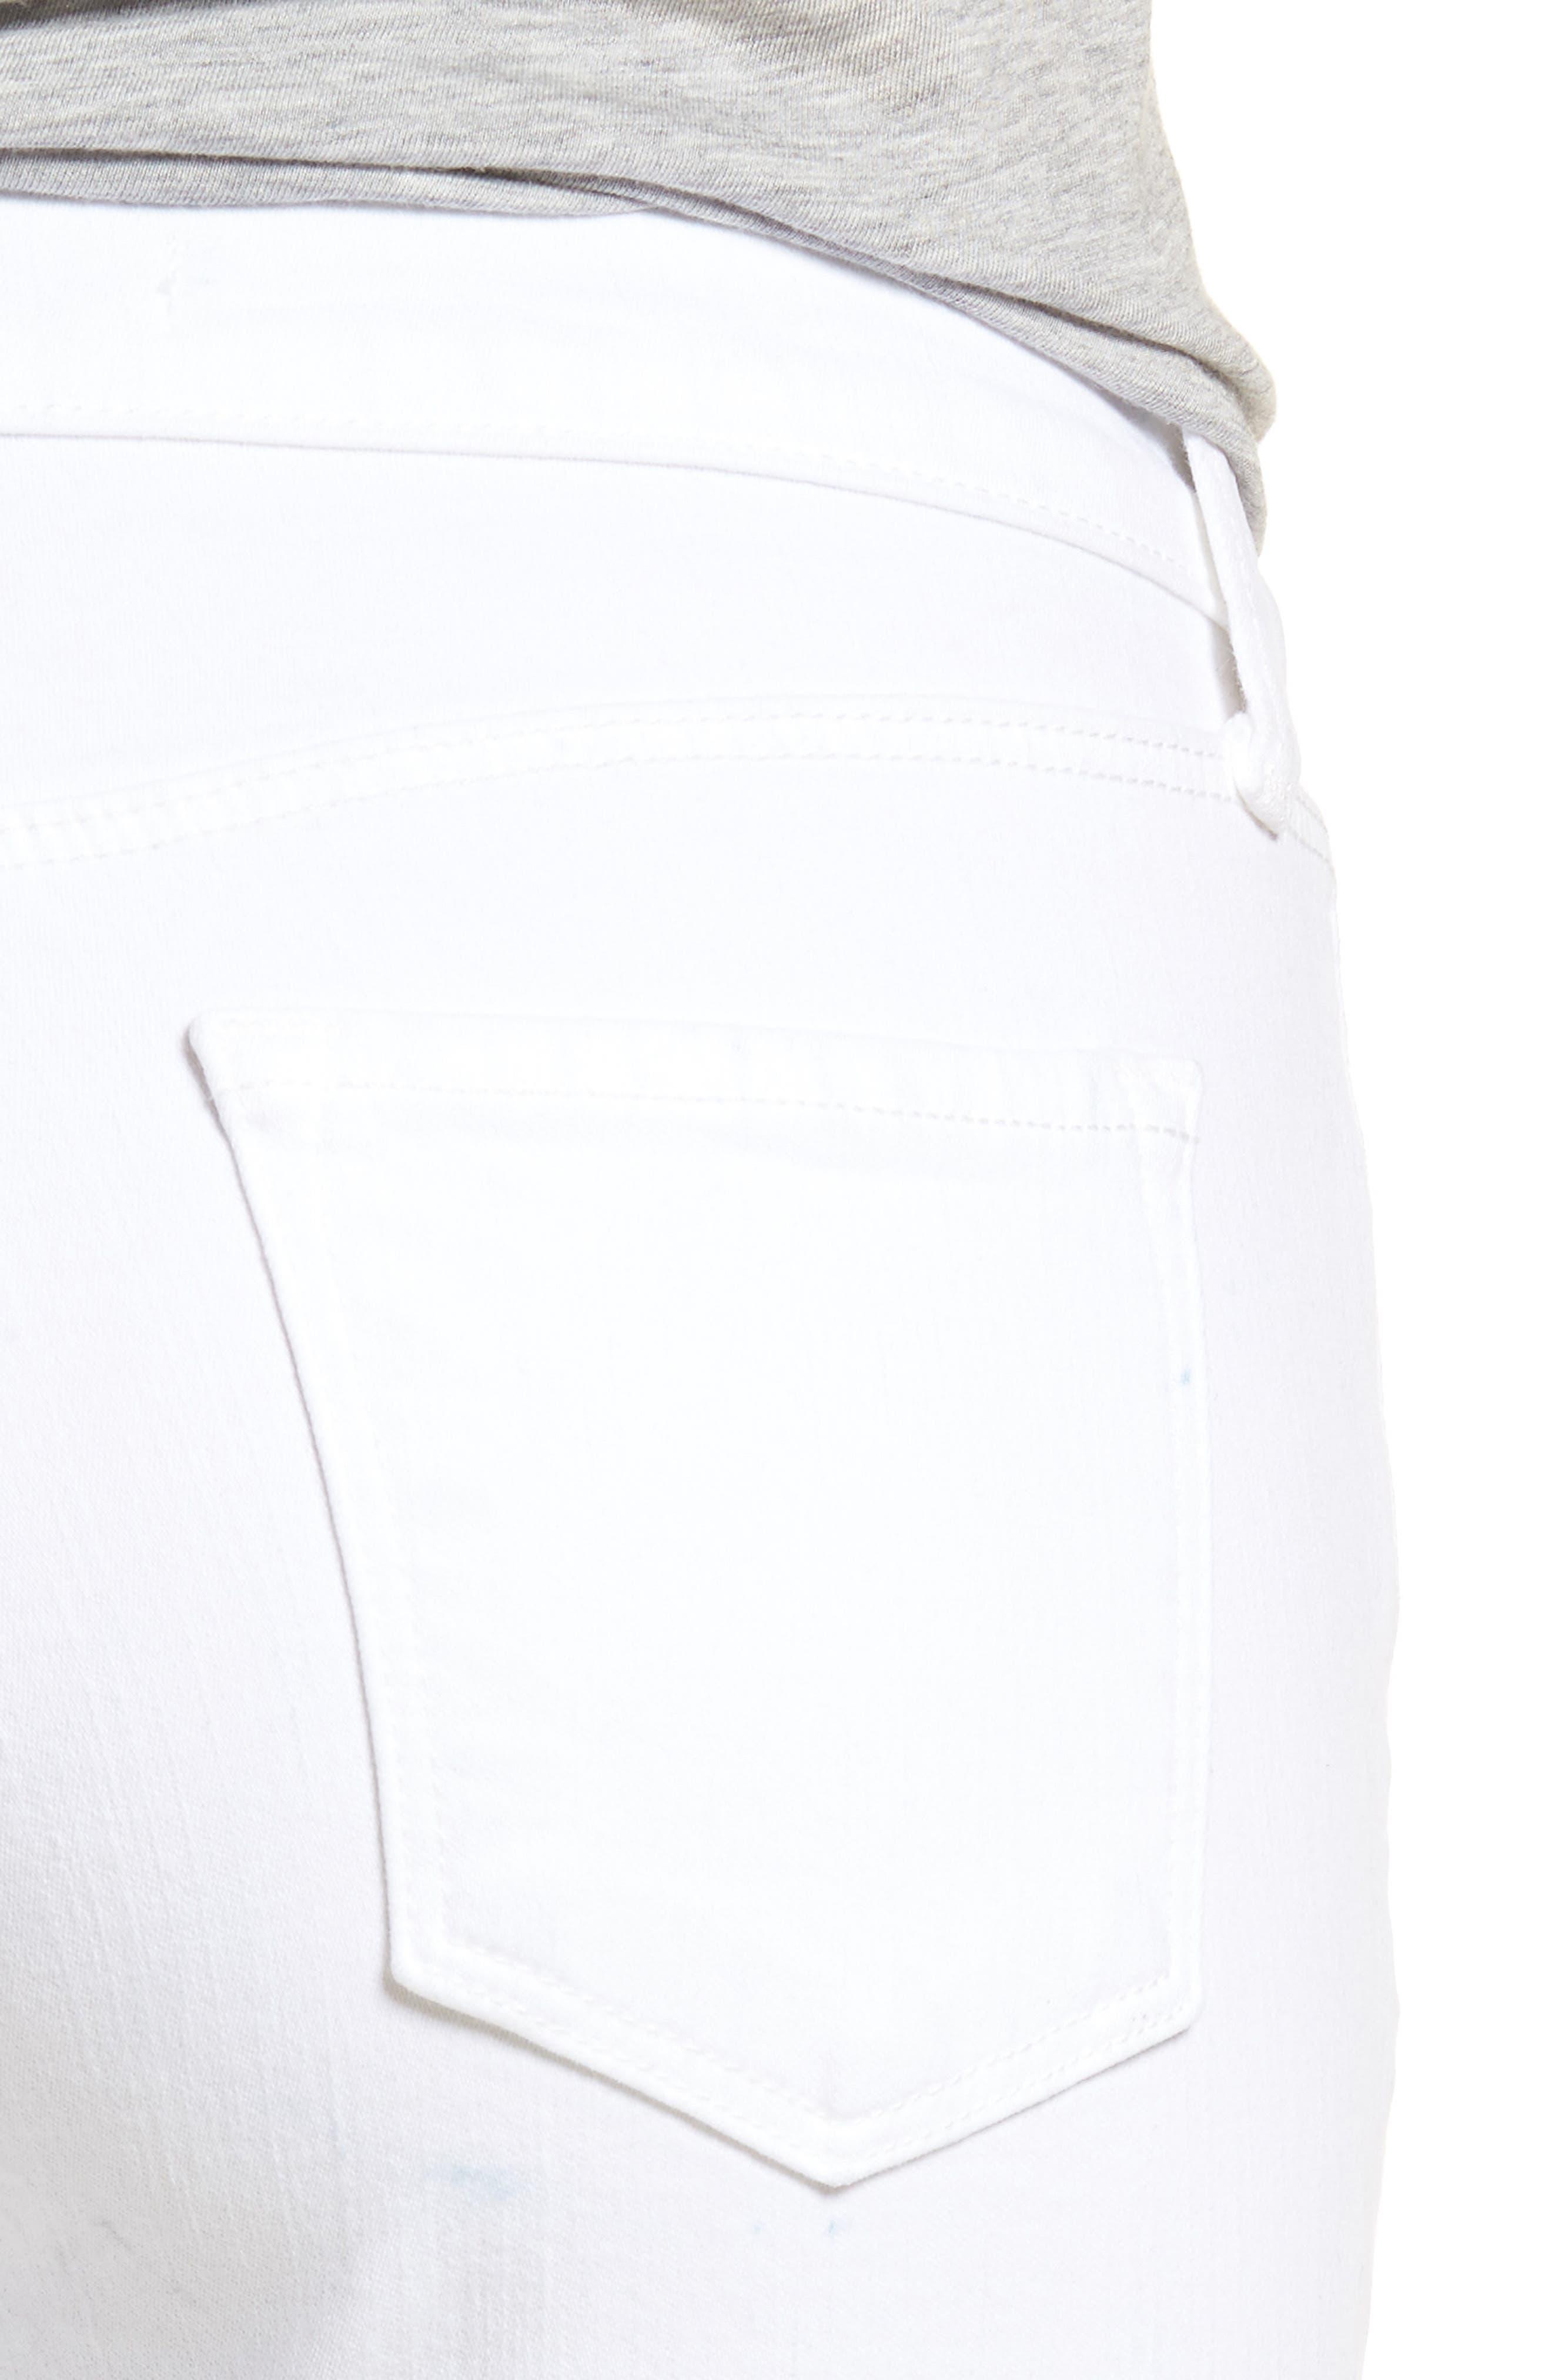 Mid-Rise Capri Skinny Jeans,                             Alternate thumbnail 4, color,                             White Mercy